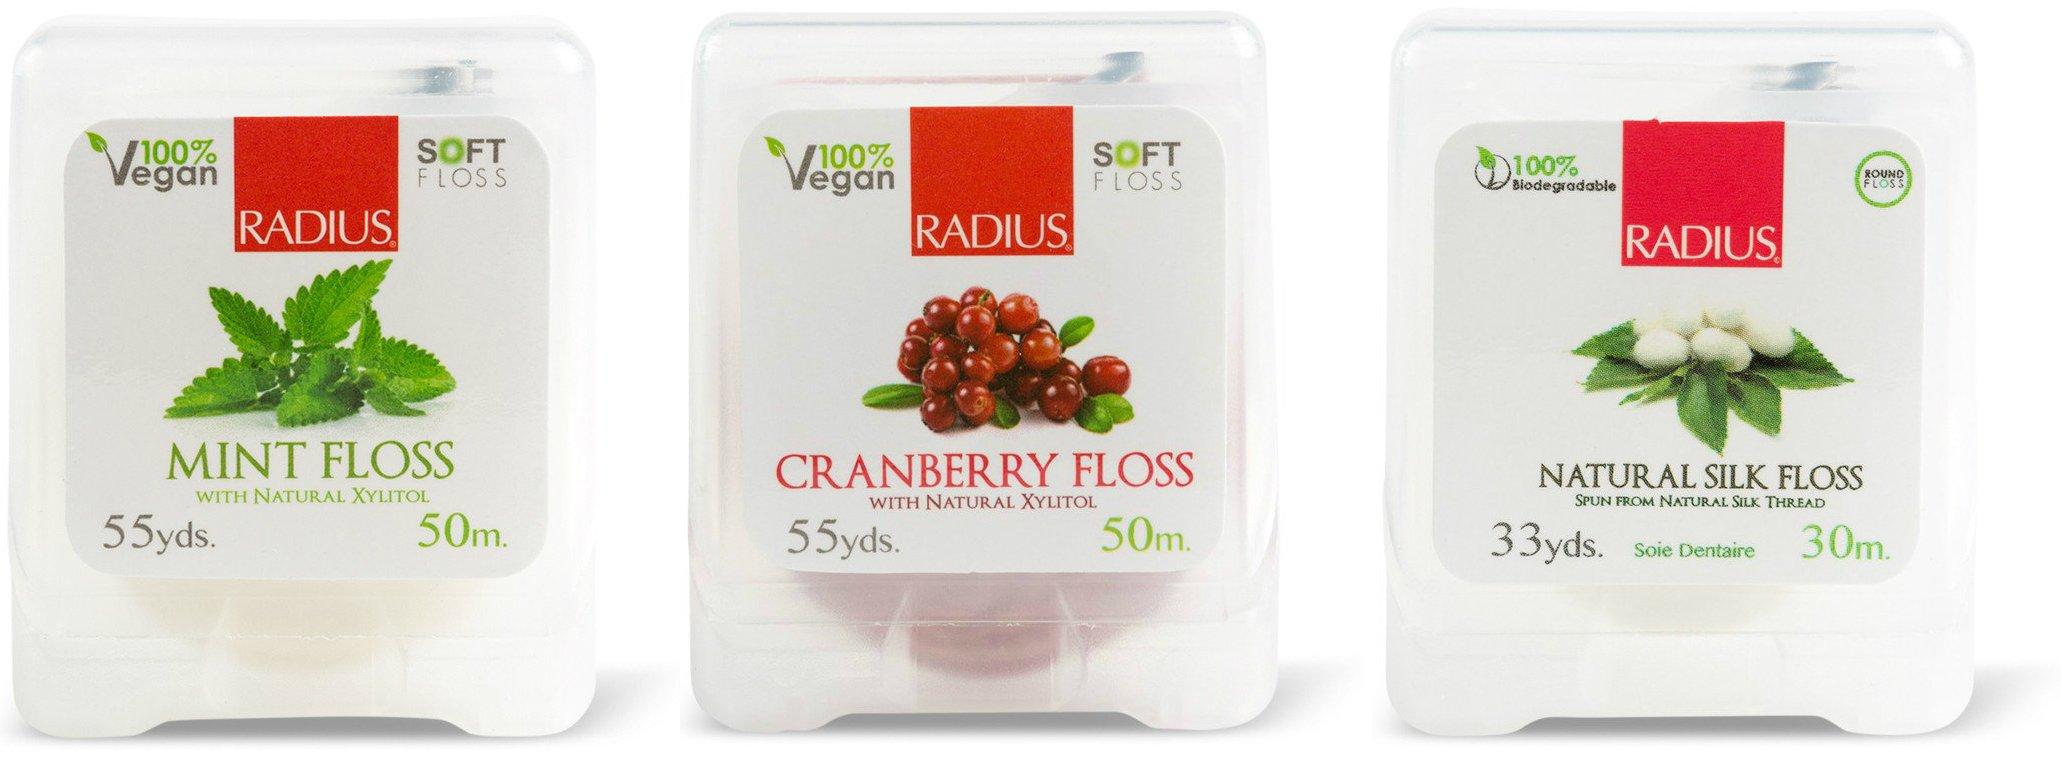 Radius Vegan Xylitol Floss Mint, Vegan Xylitol Floss Cranberry, and Natural Biodegradable Silk Floss Bundle, 55 yds, 55 yds, and 33 yds. each